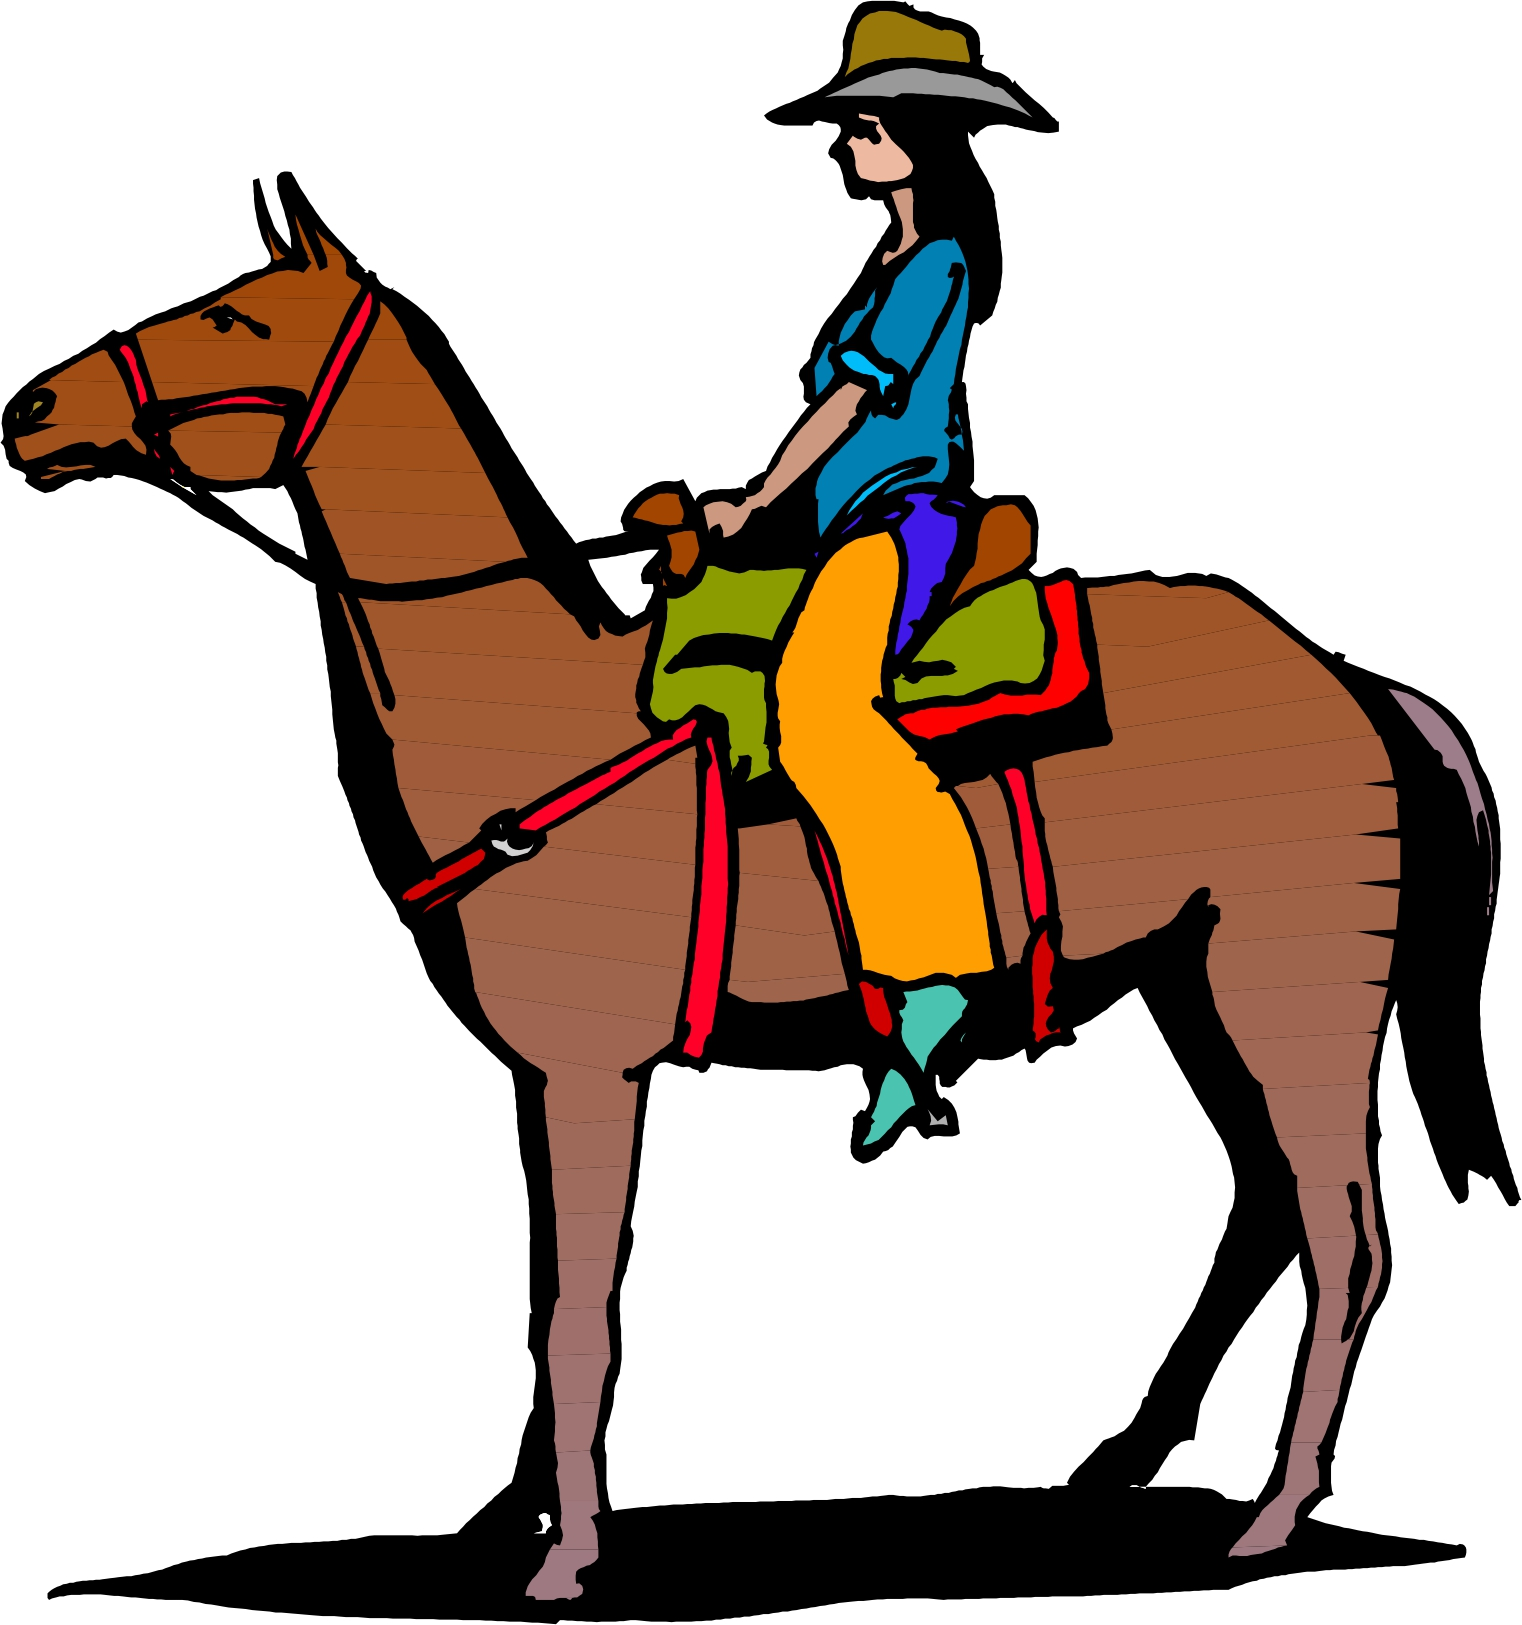 Cowgirl clipart riding horse Photo#2 Horse Horse Riding riding